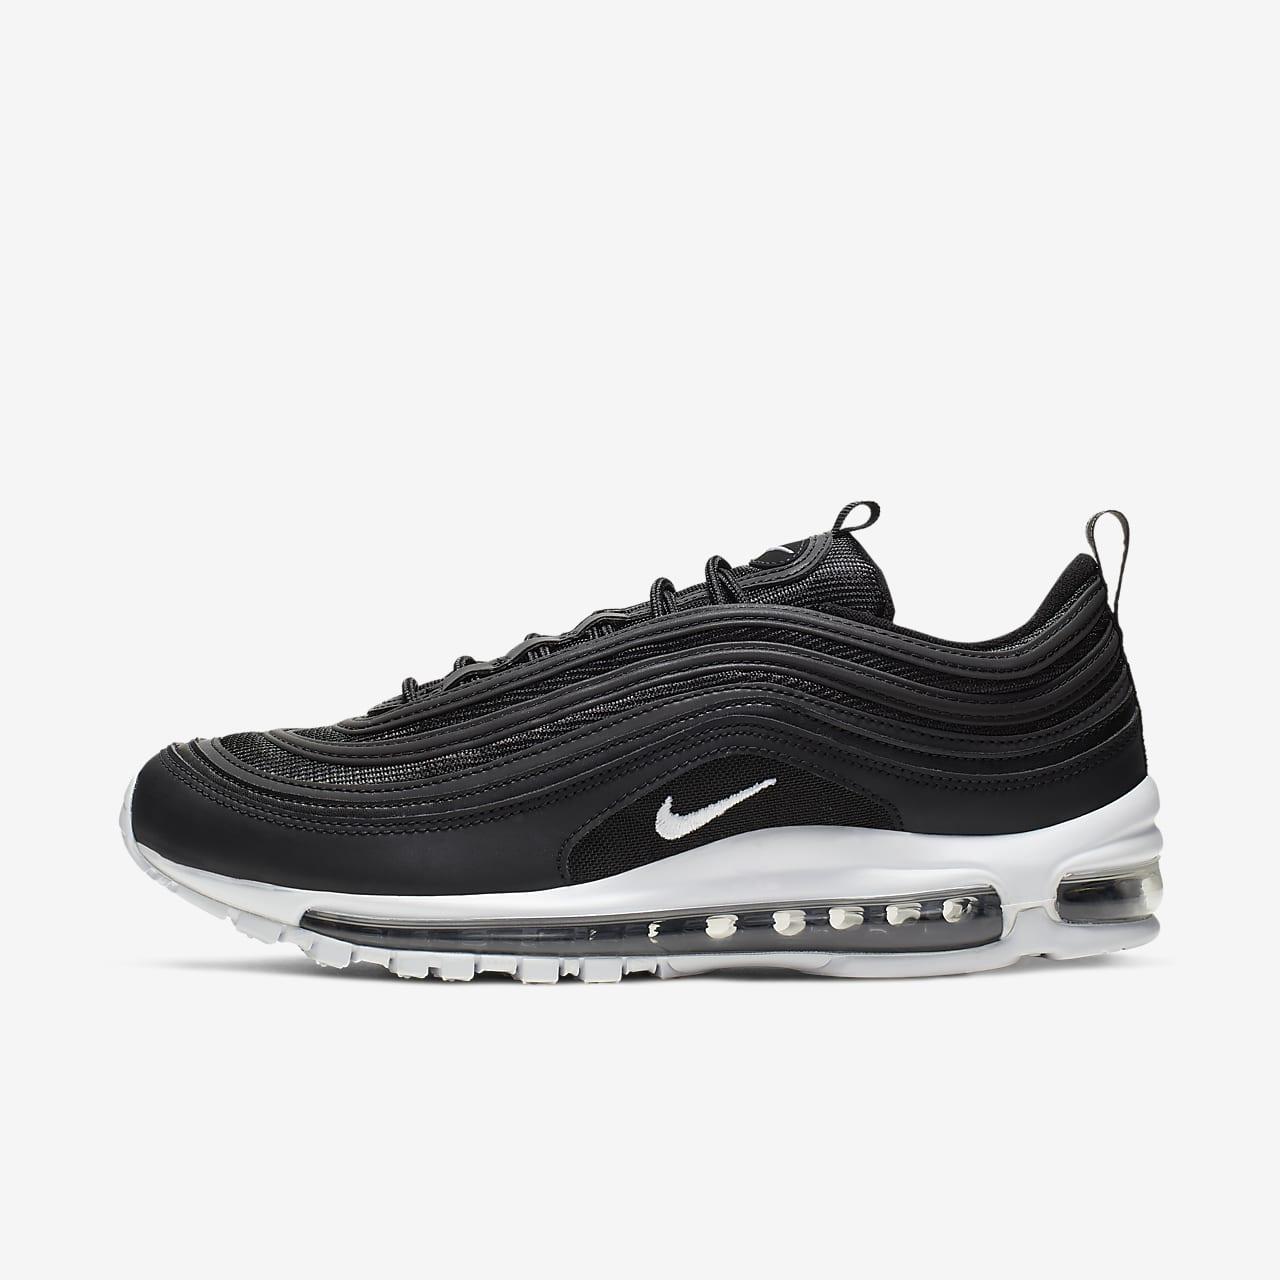 Chaussures Nike Lunar noires Casual homme BkyJIb